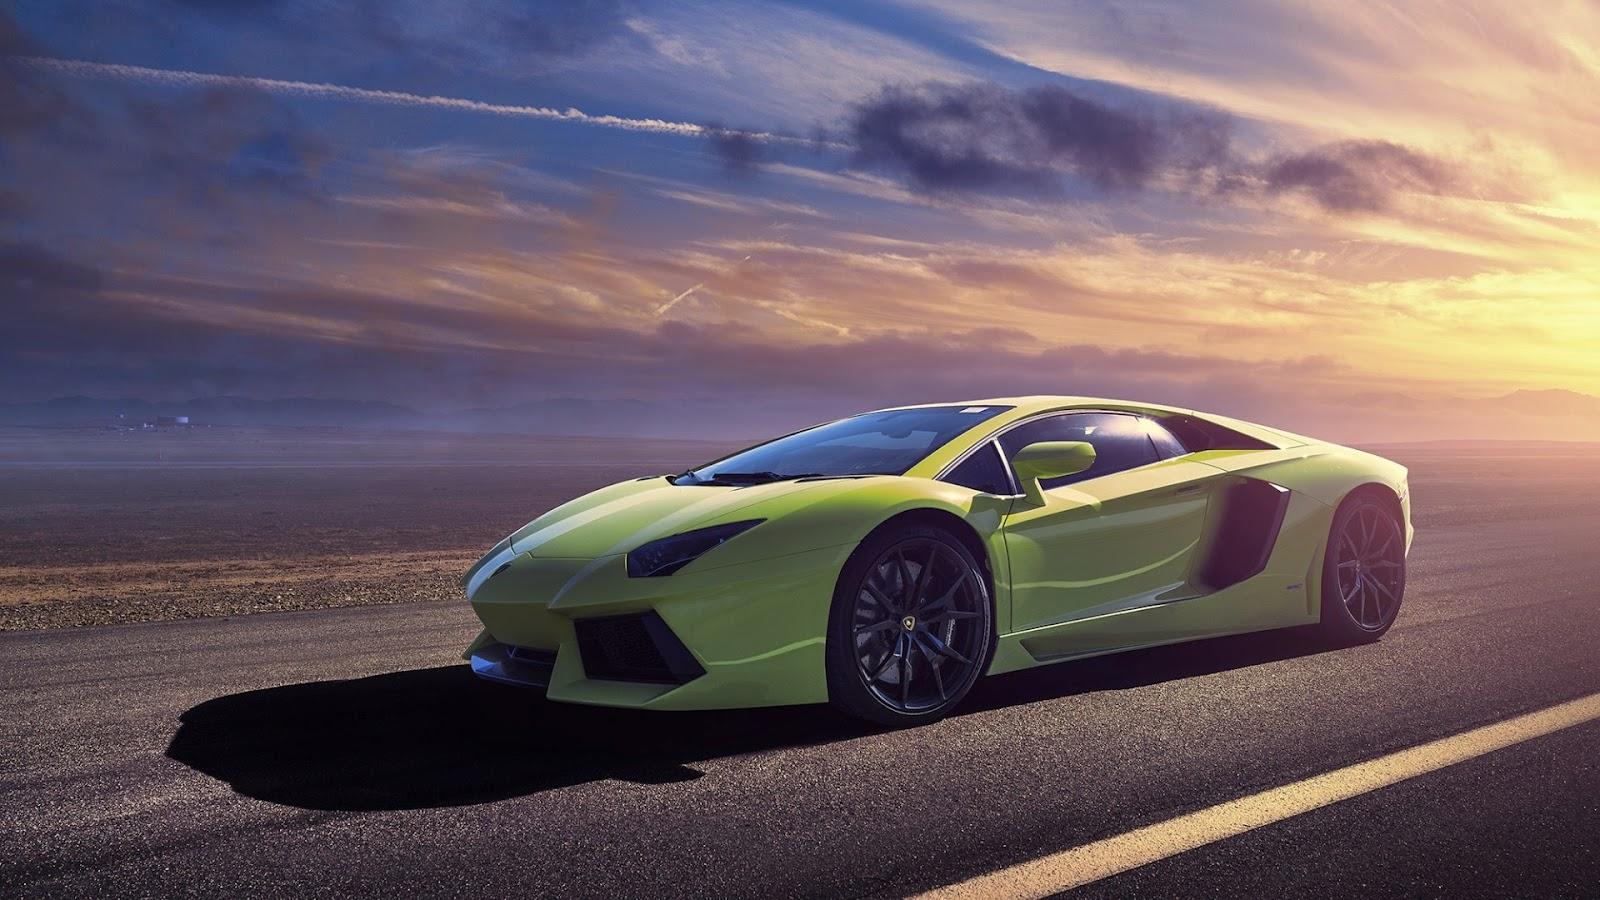 Lamborghini car high resolution pictures